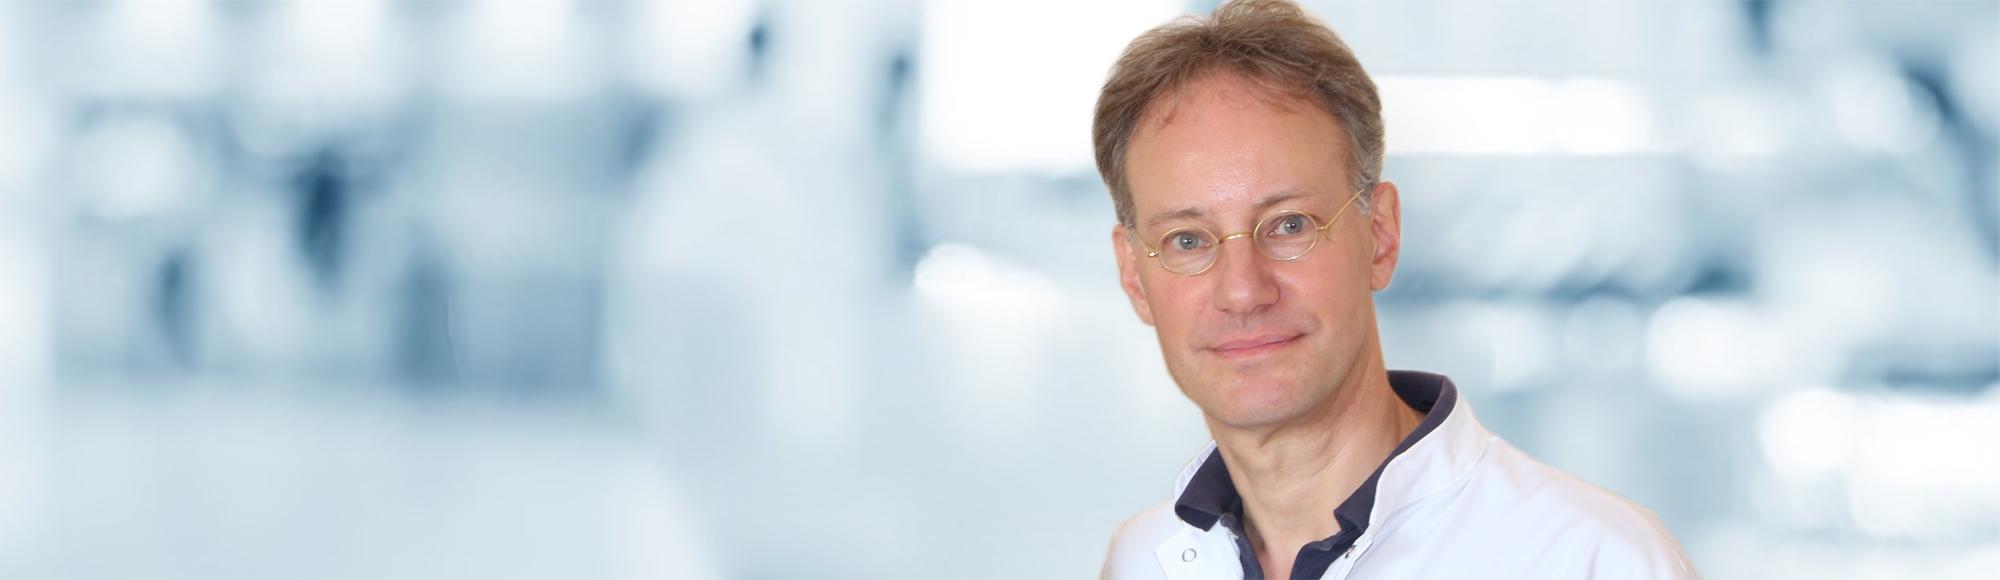 Dr Sylvester M Maas plastic surgeon